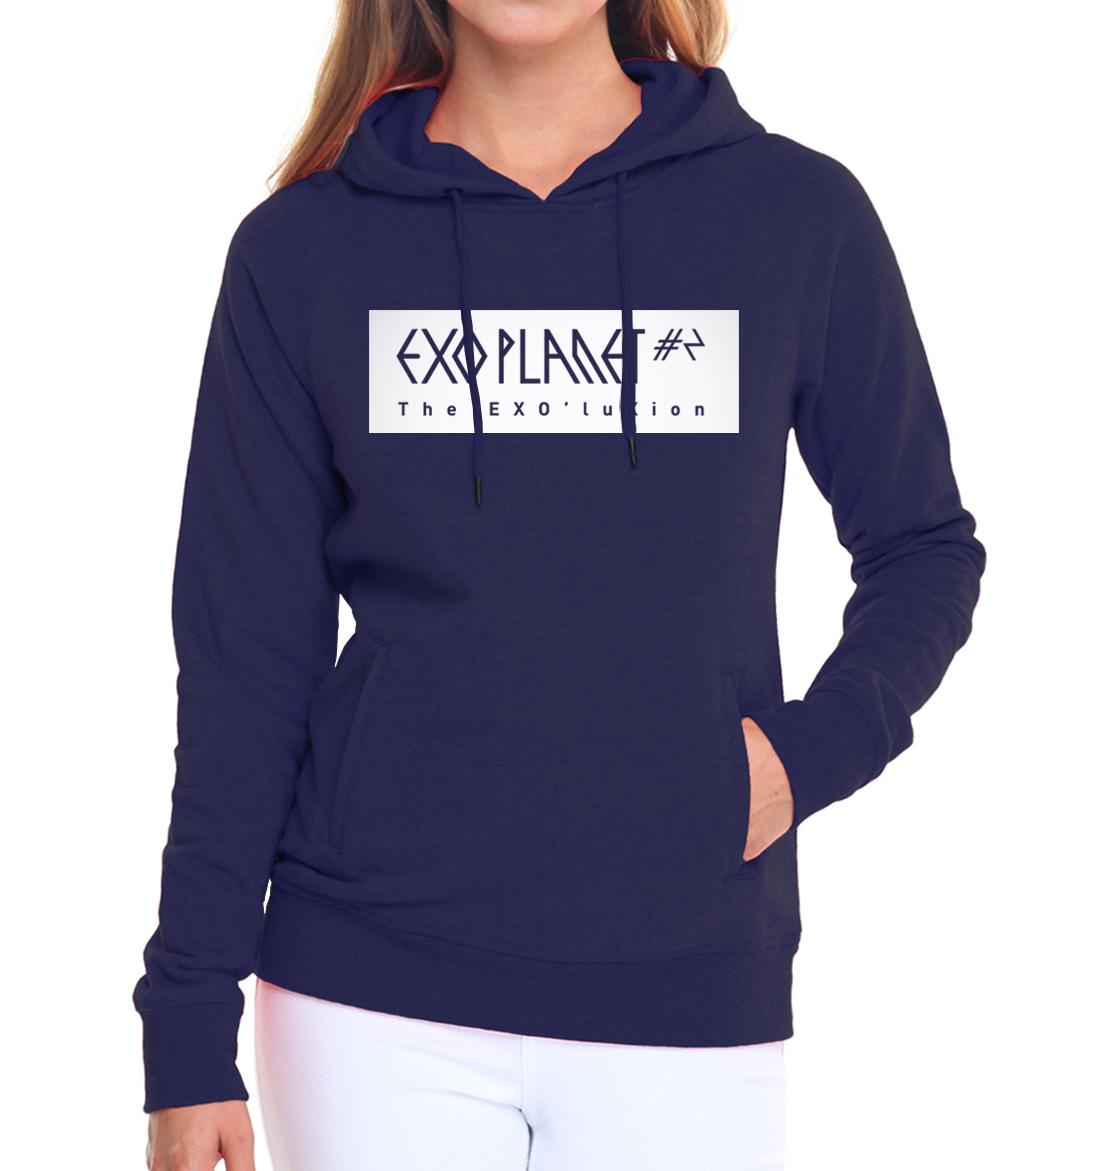 Star The Same harajuku sweatshirts 2019 autumn winter Hot Sale pullovers women fleece keep warm brand tracksuits funny hooded